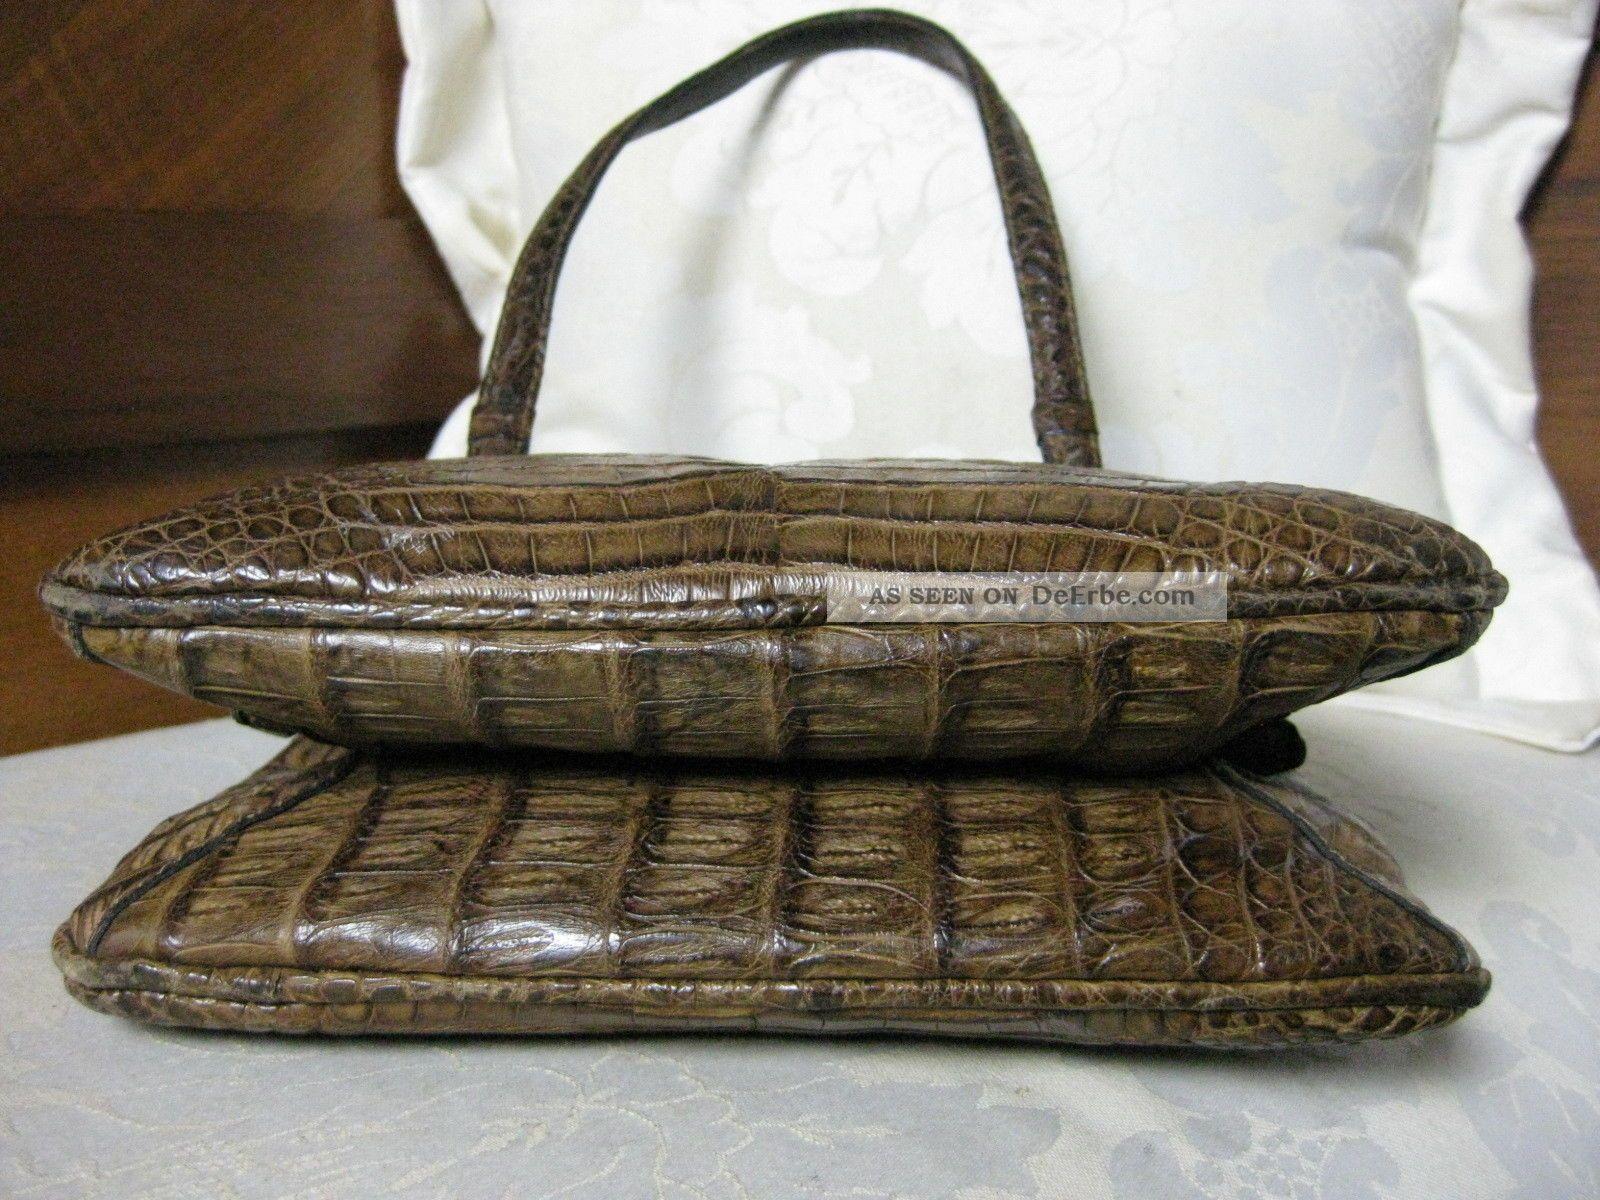 5992e9ffd90bf Schöne Echte Handtasche Tasche Kroko Ledertasche Sehr OrigJaguar dCBoxe